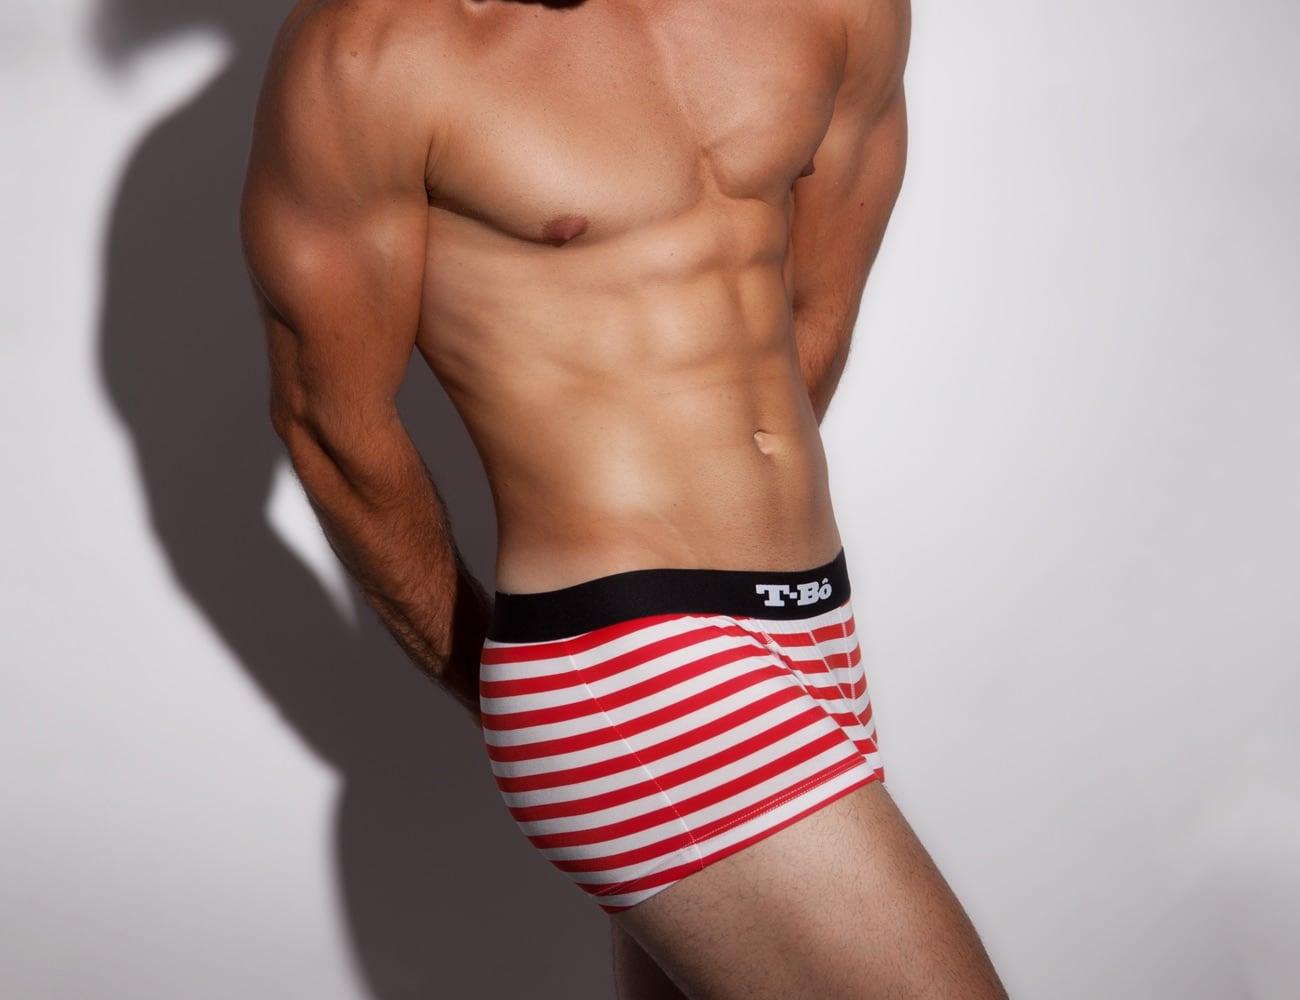 T-Bô Ultra Comfortable Men's Underwear